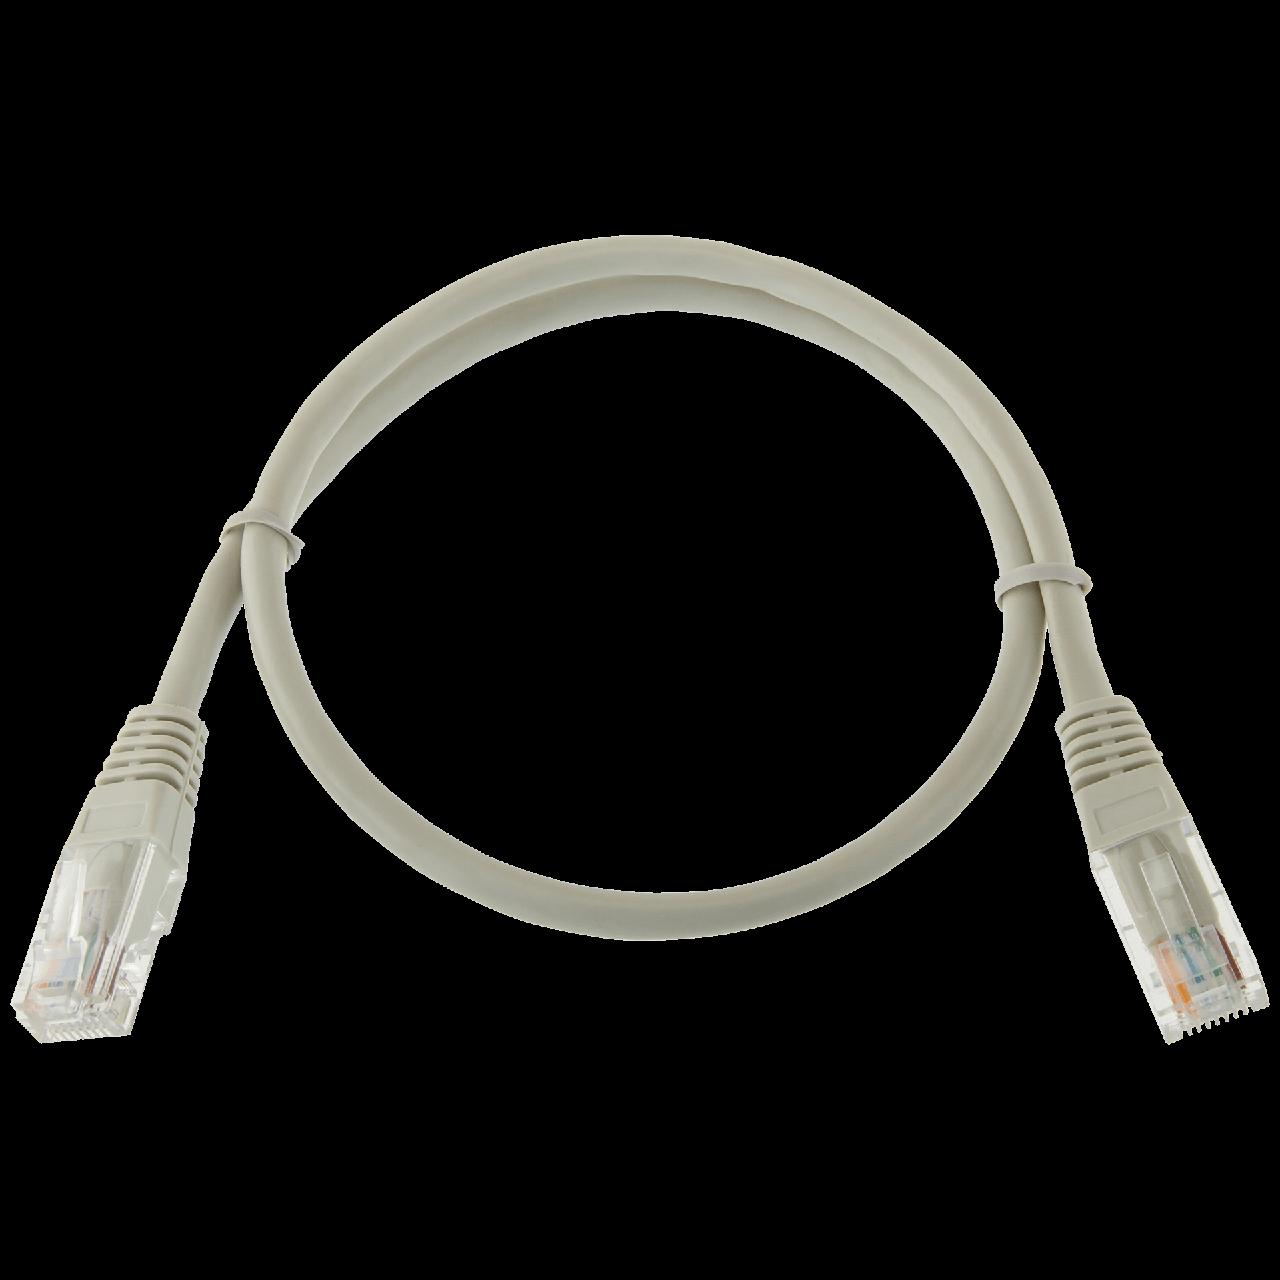 Патч-корд литой LogicPower UTP RJ45 кат. 5Е 0.5 м (серый)